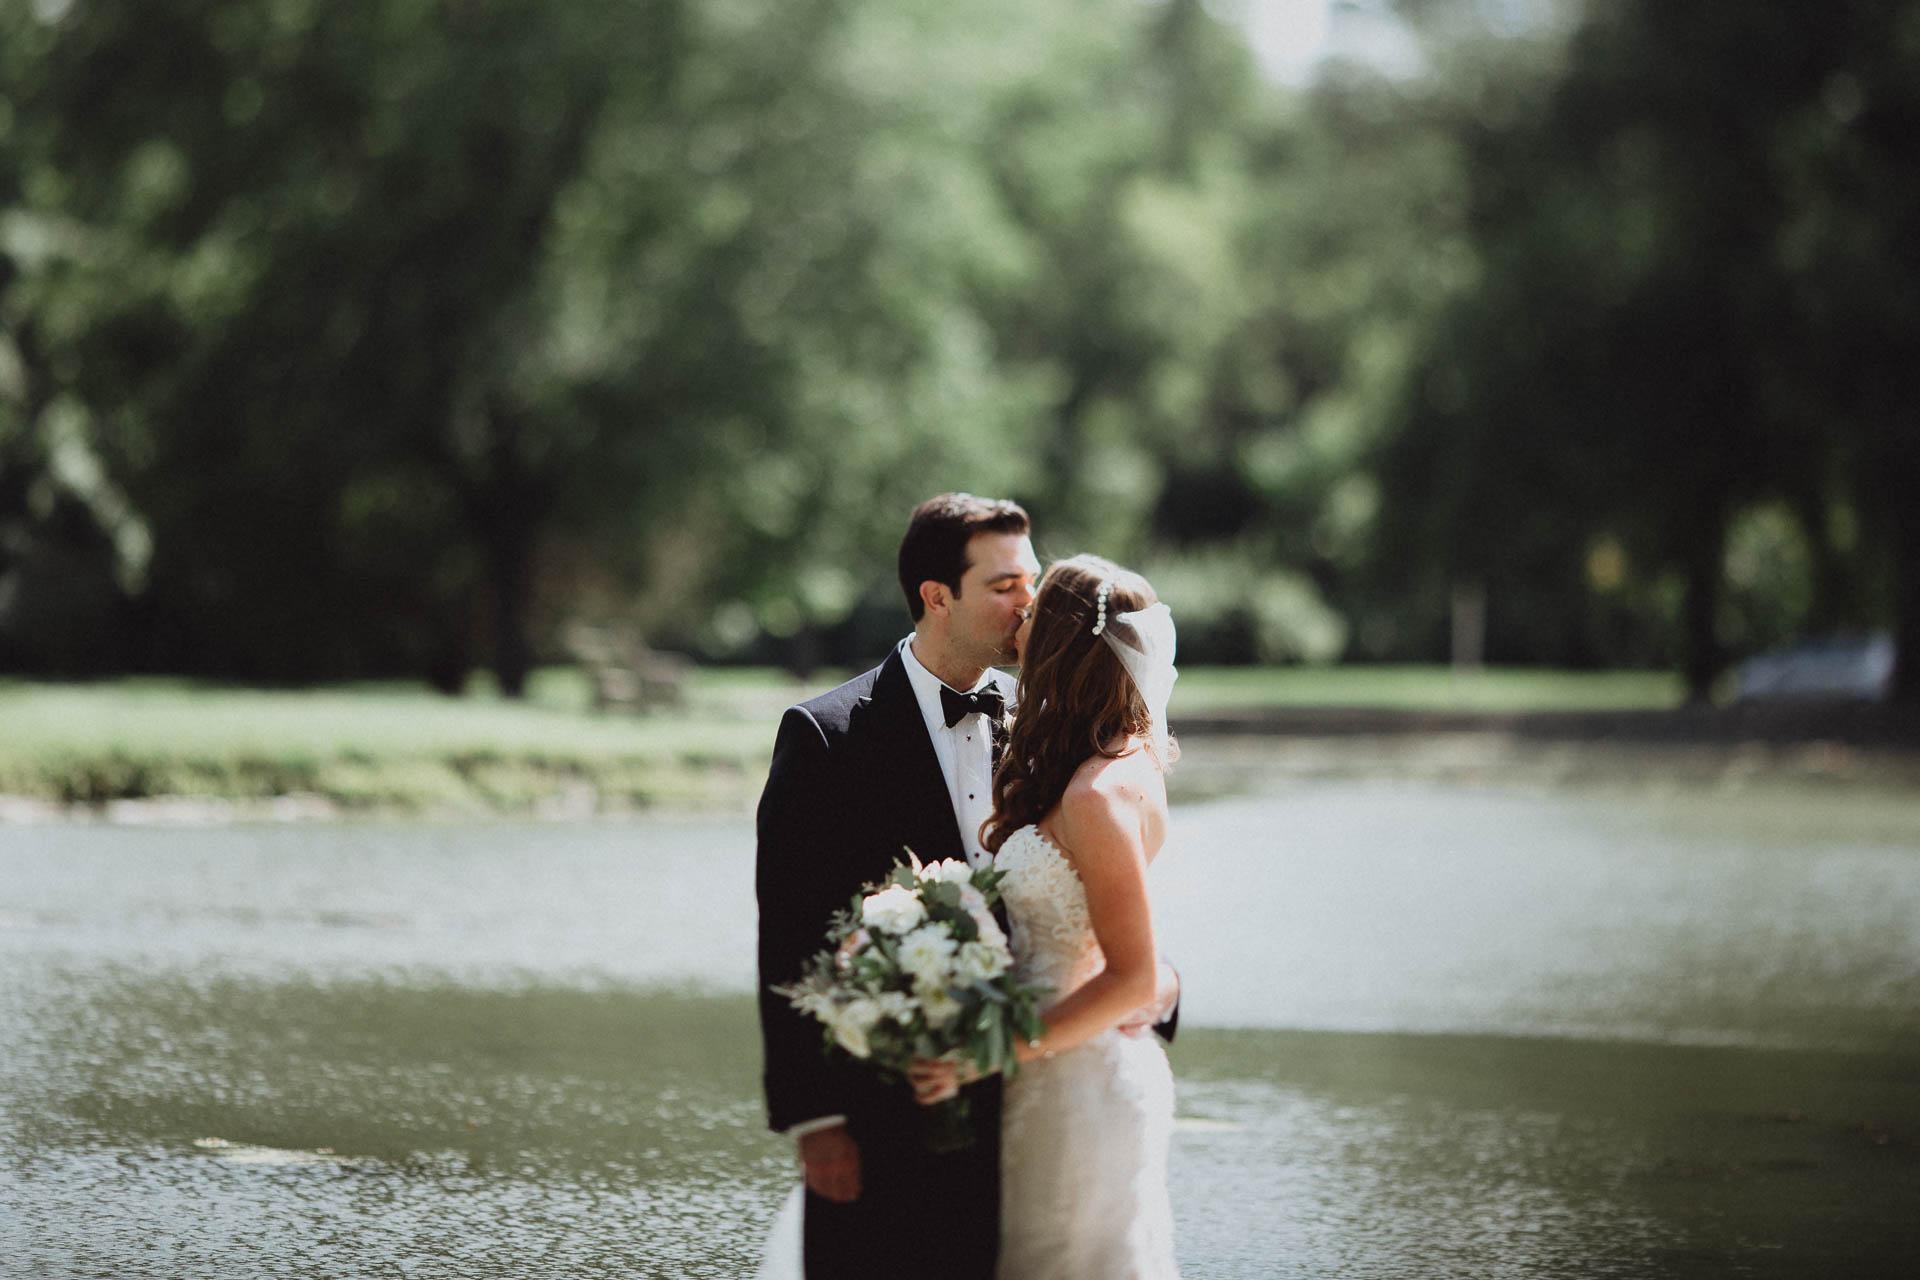 Keri-Joseph-Top-of-the-Market-Wedding-109@2x.jpg